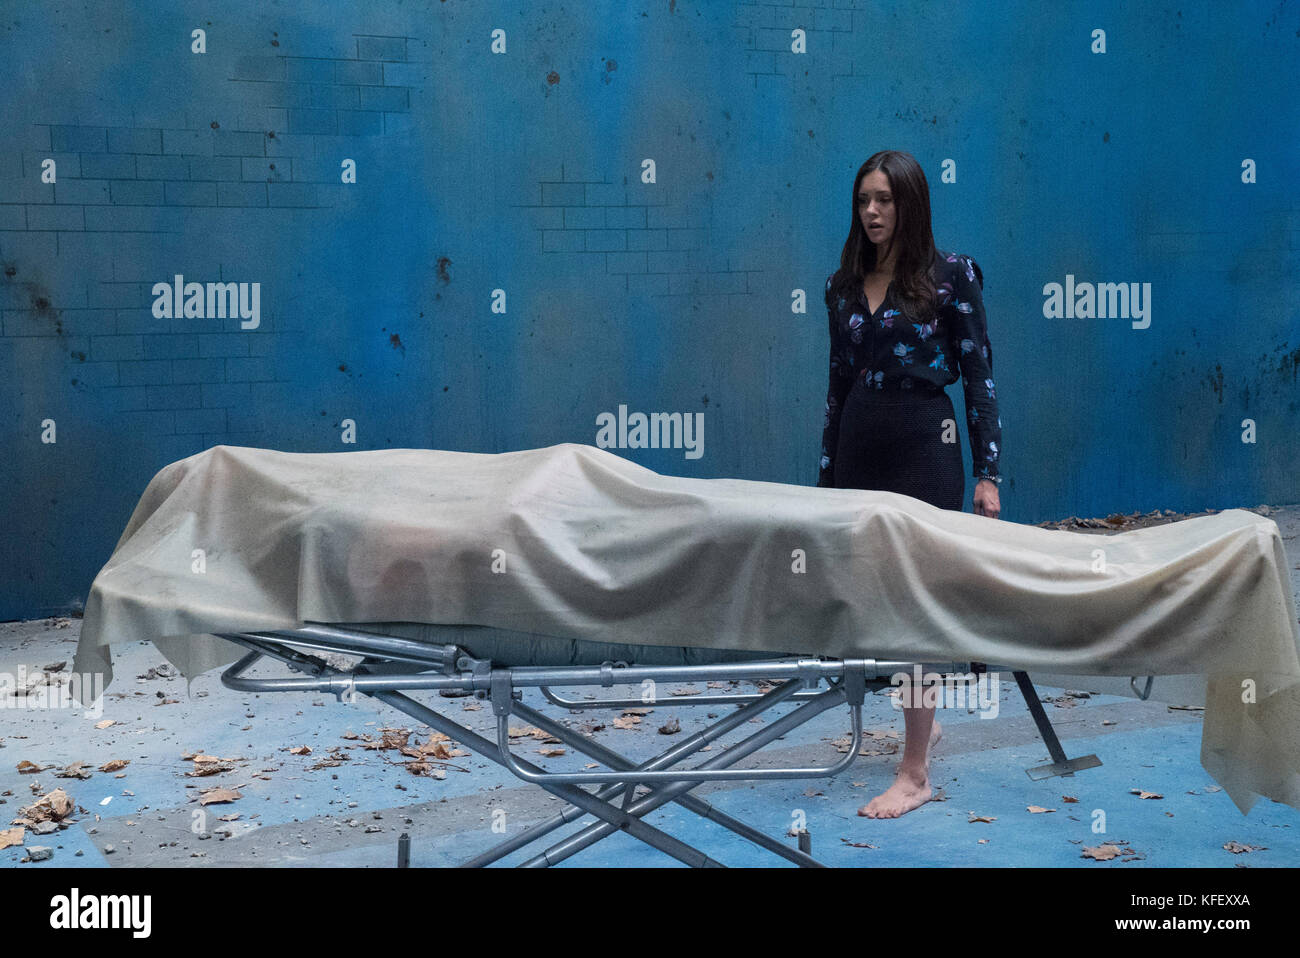 RELEASE DATE: September 29, 2017 TITLE: Flatliners. STUDIO: Columbia Pictures. DIRECTOR: Niels Arden Oplev. PLOT: - Stock Image